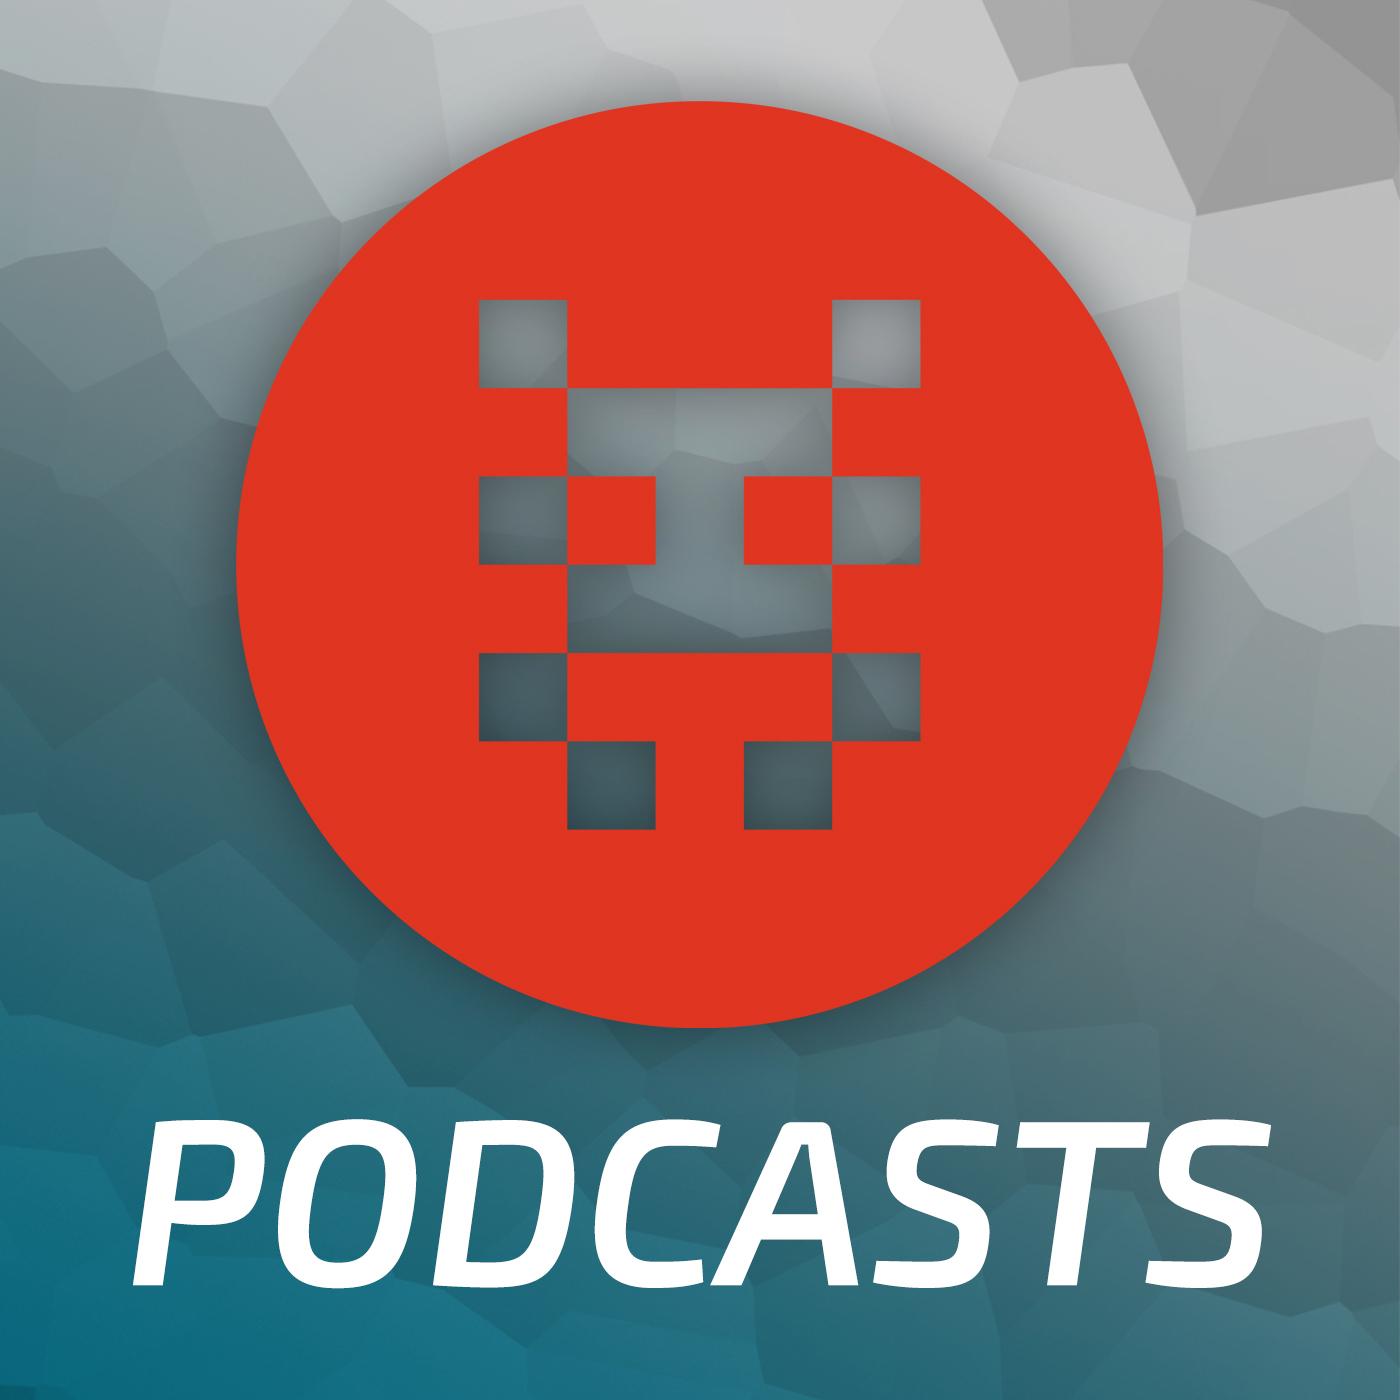 VORZOCKER - Podcasts